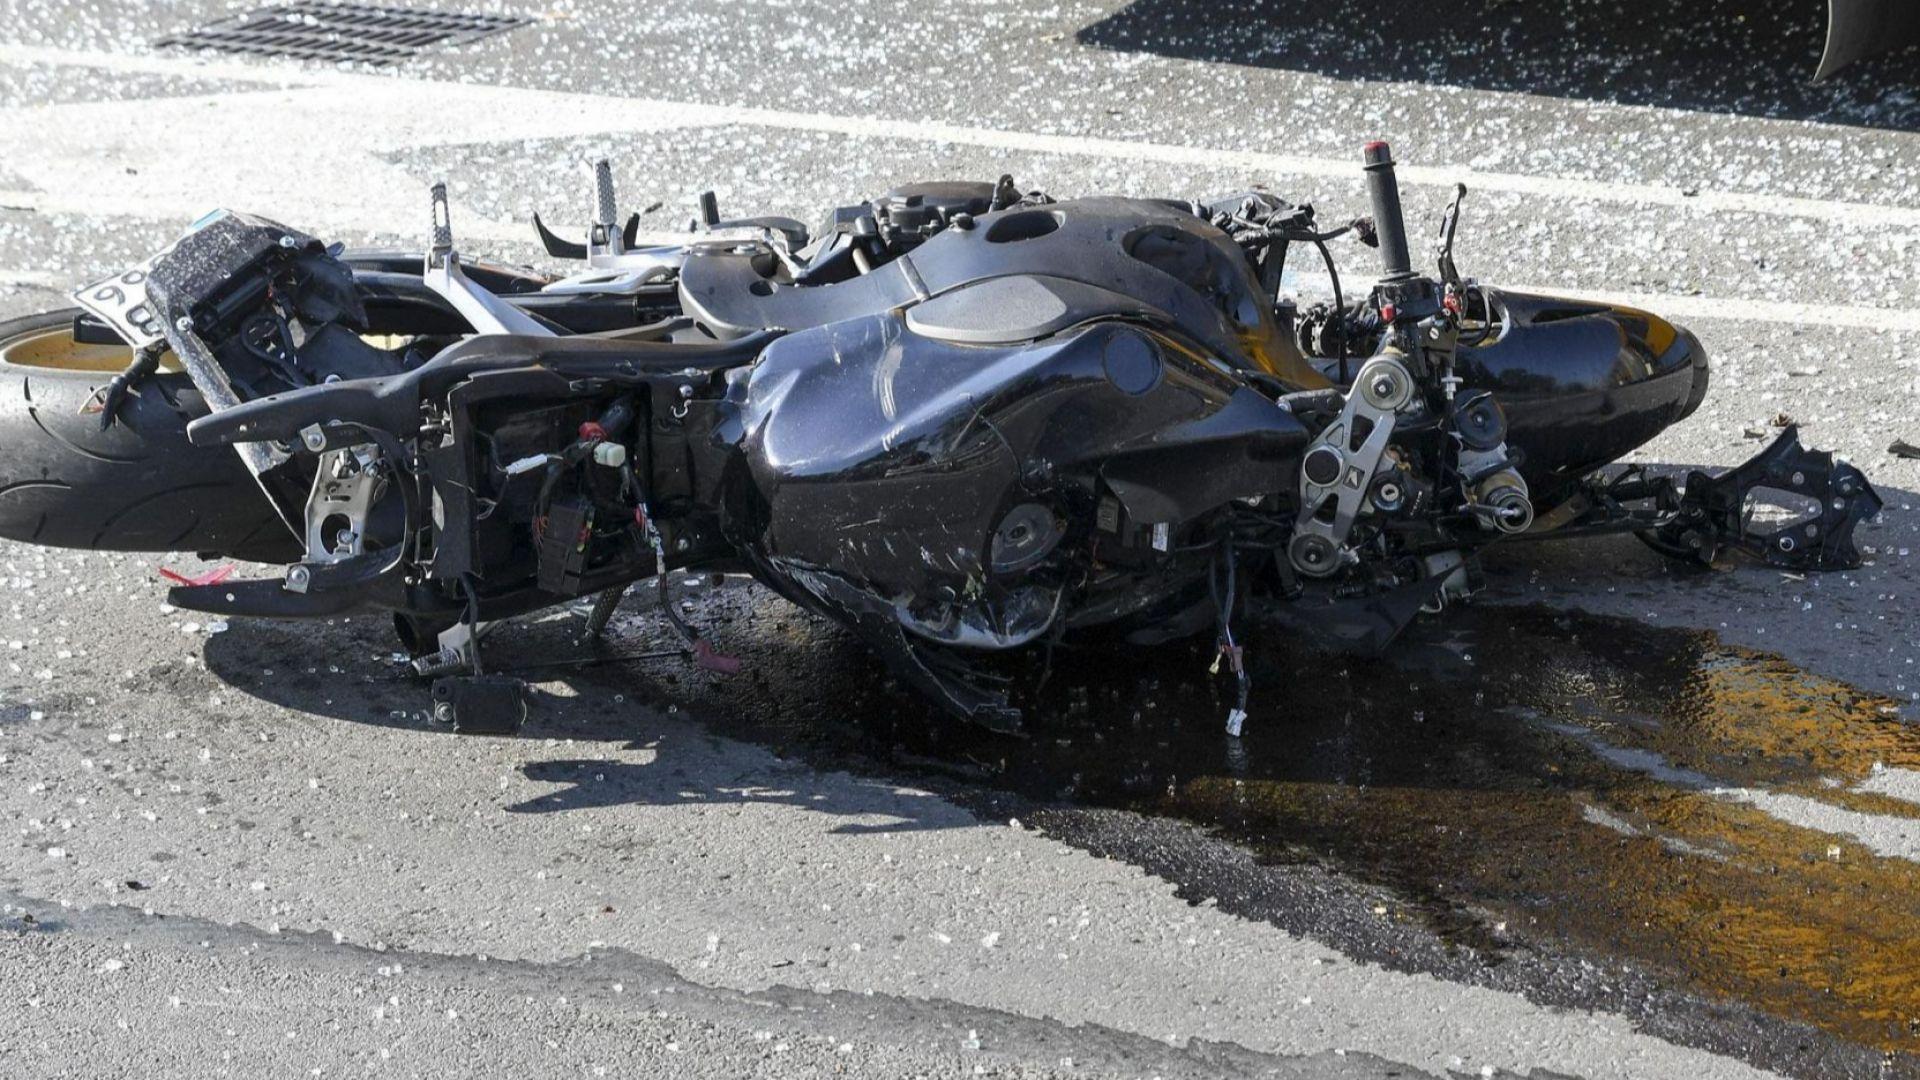 Млад моторист загина след удар в стълб в Пловдив